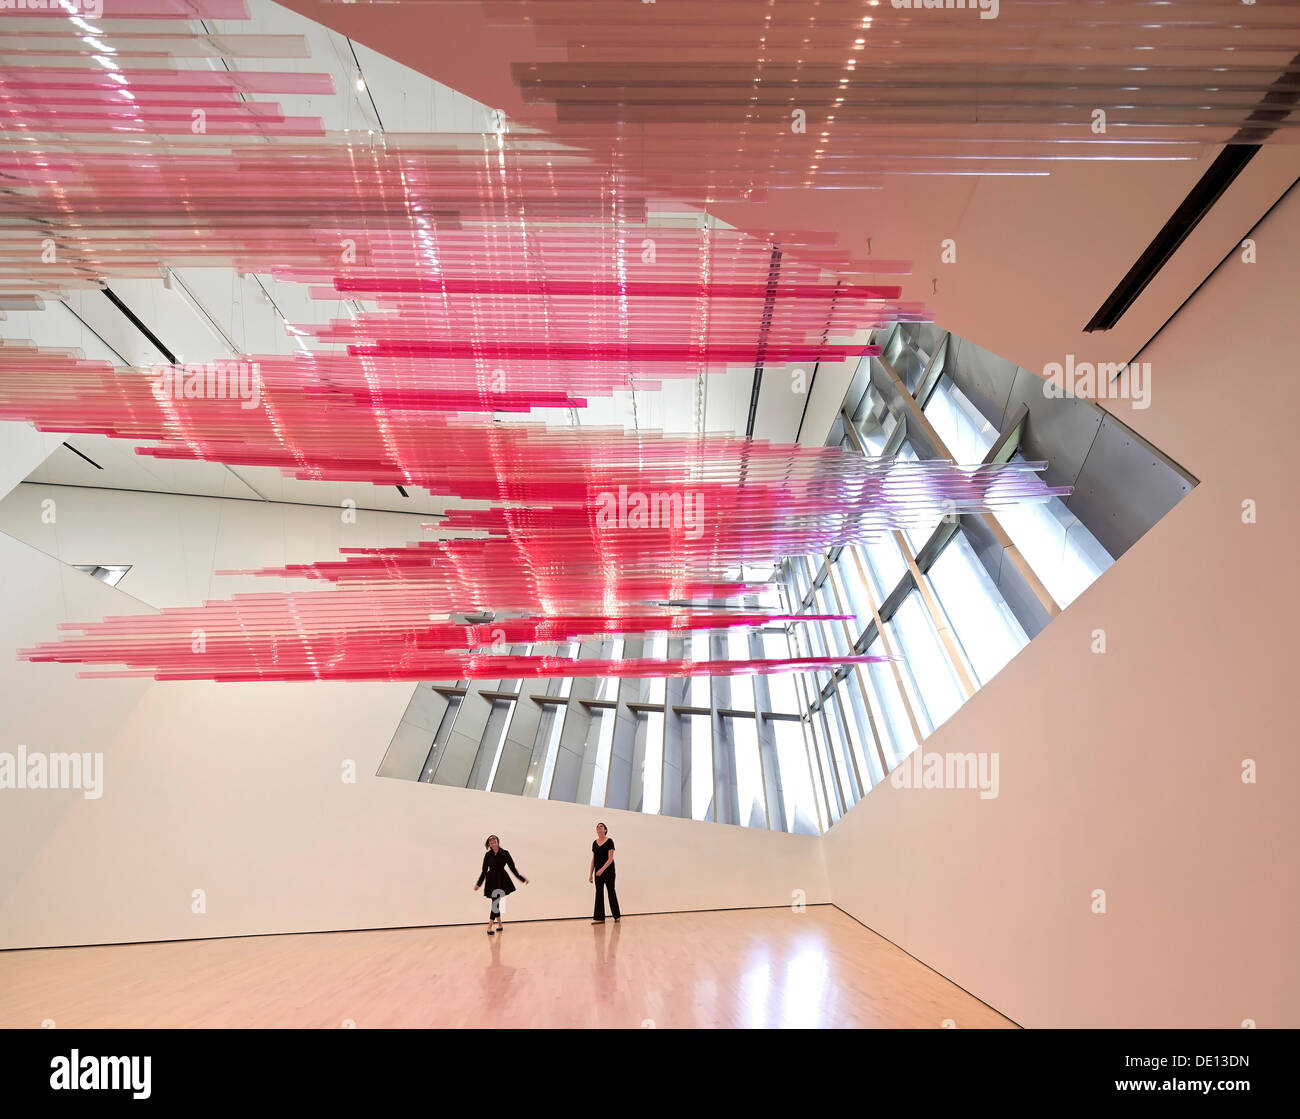 http://h7.alamy.com/comp/DE13DN/eli-edythe-broad-art-museum-lansing-united-states-architect-zaha-hadid-DE13DN.jpg